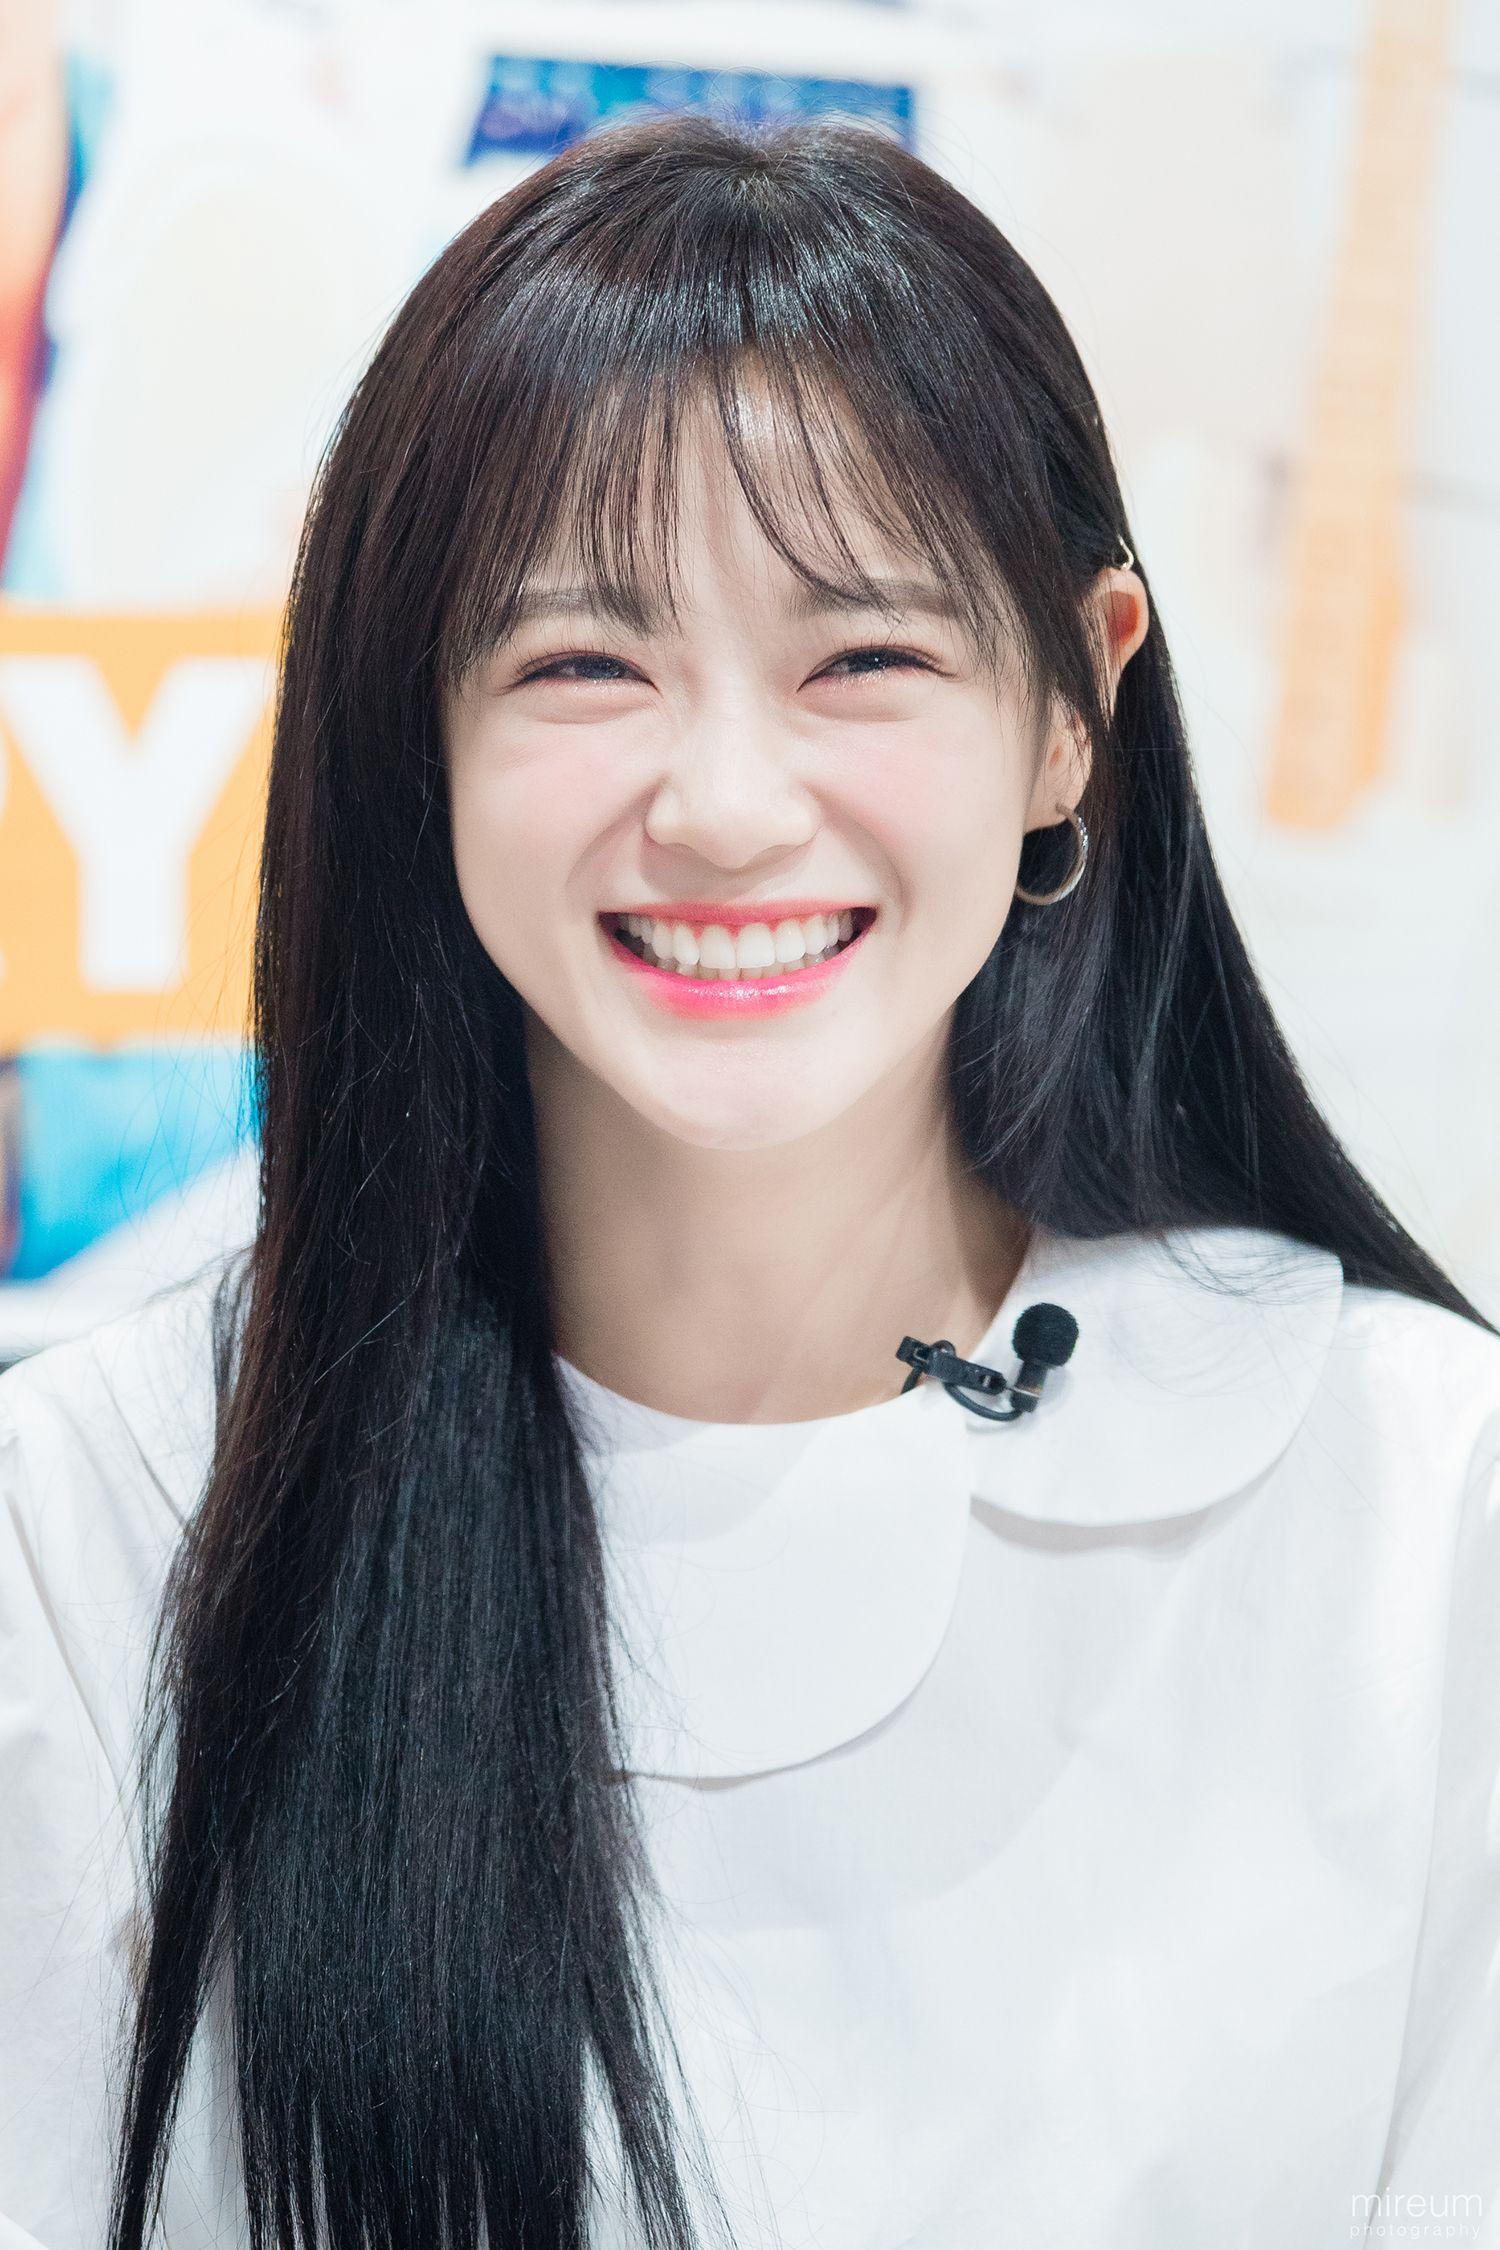 im the heroine | Somi, Jeon somi, Girl